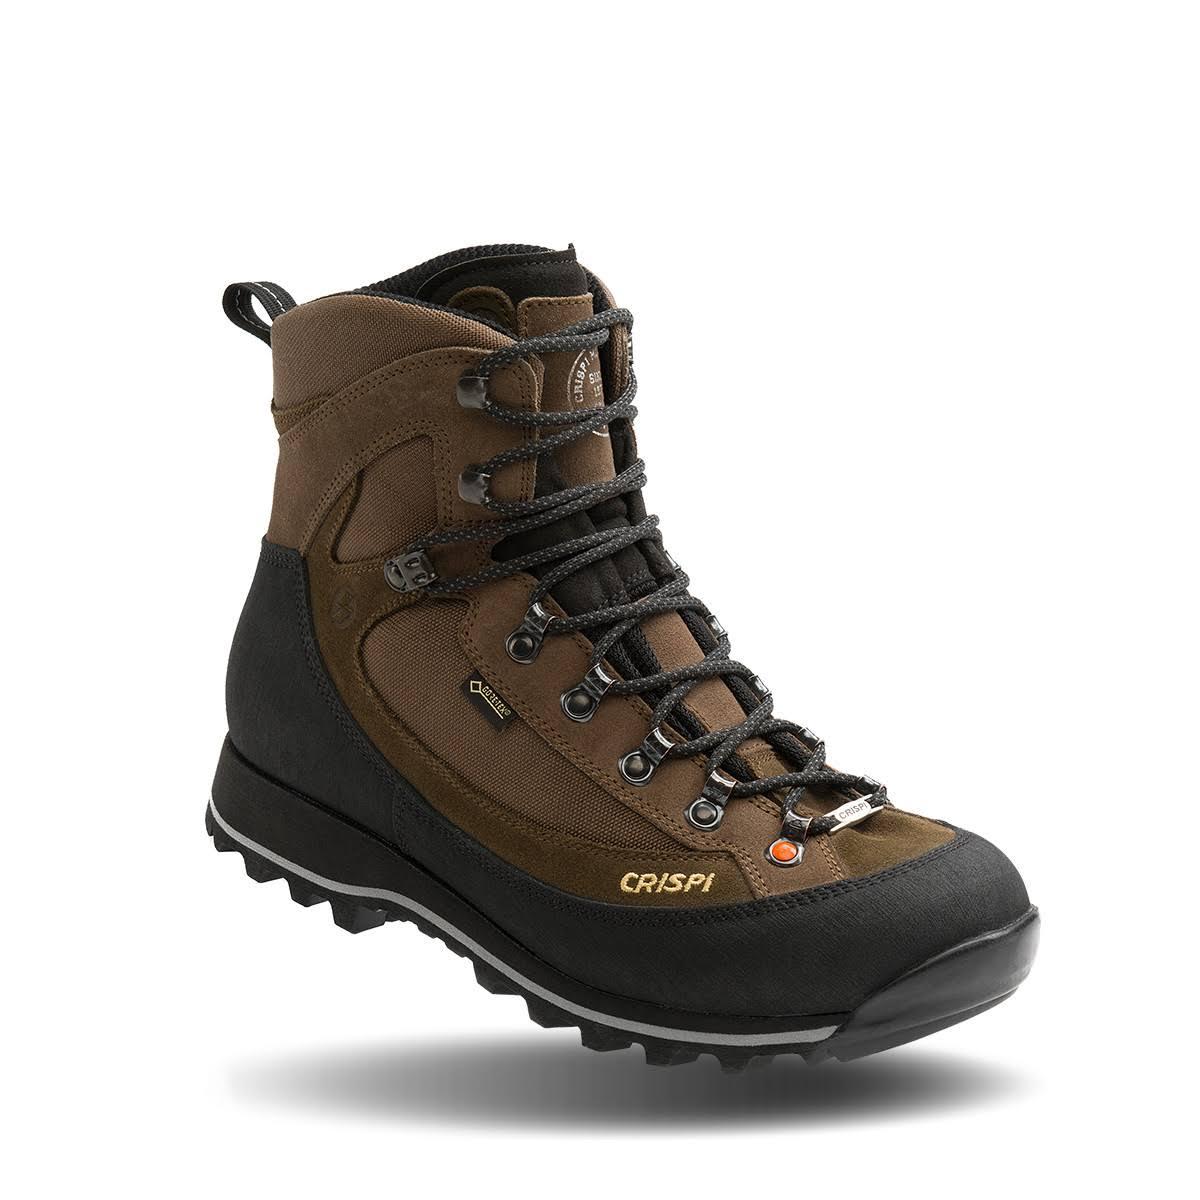 brown 12 Hunting Summit Gtx Crispi Boot LAcq54Rj3S